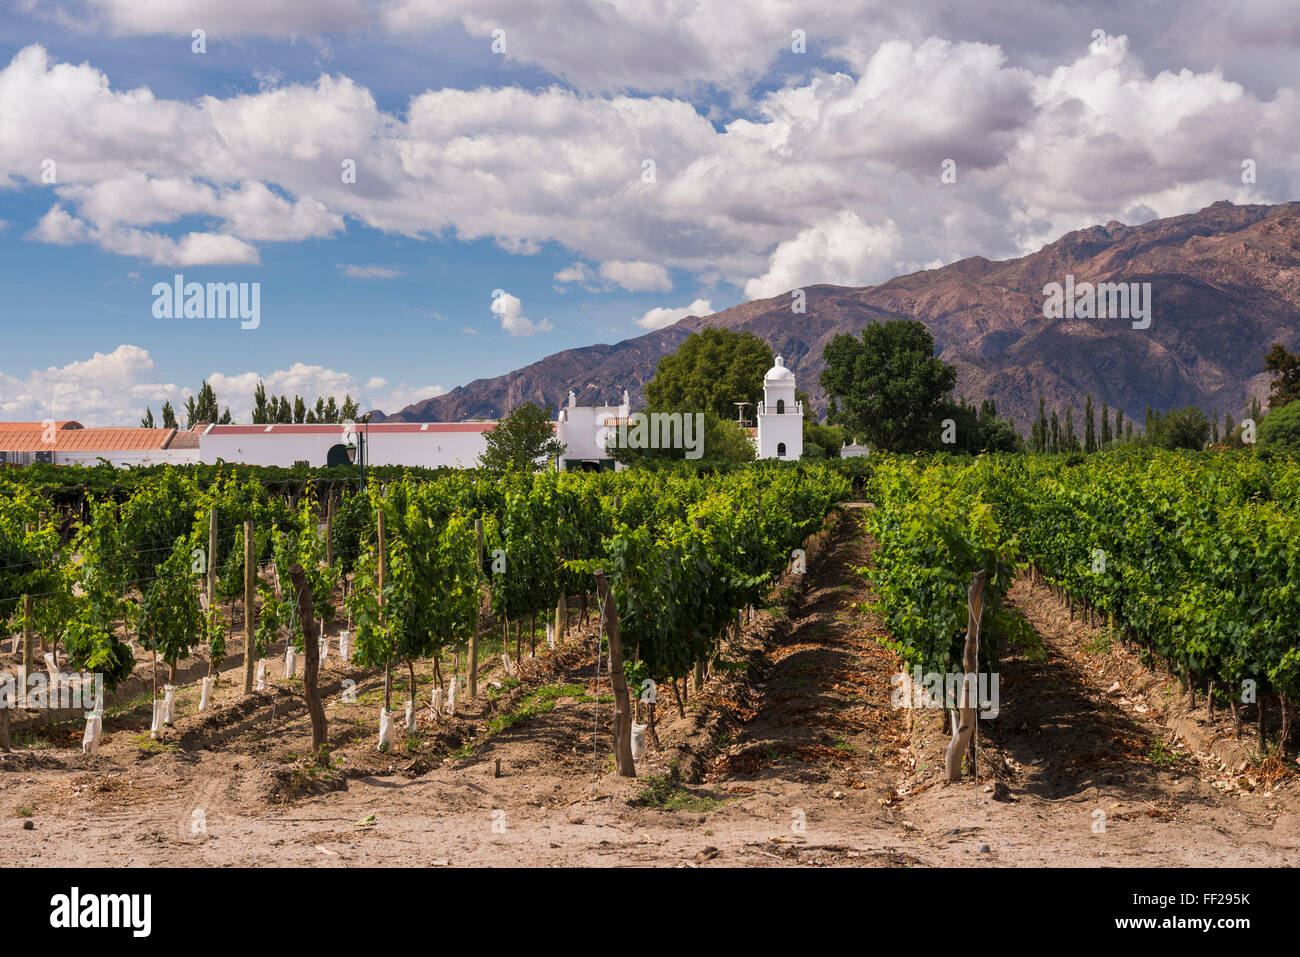 Bodega ERM Esteco, a winery and vineyard in Cafayate, SaRMta Province, North Argentina, Argentina, South America - Stock Image